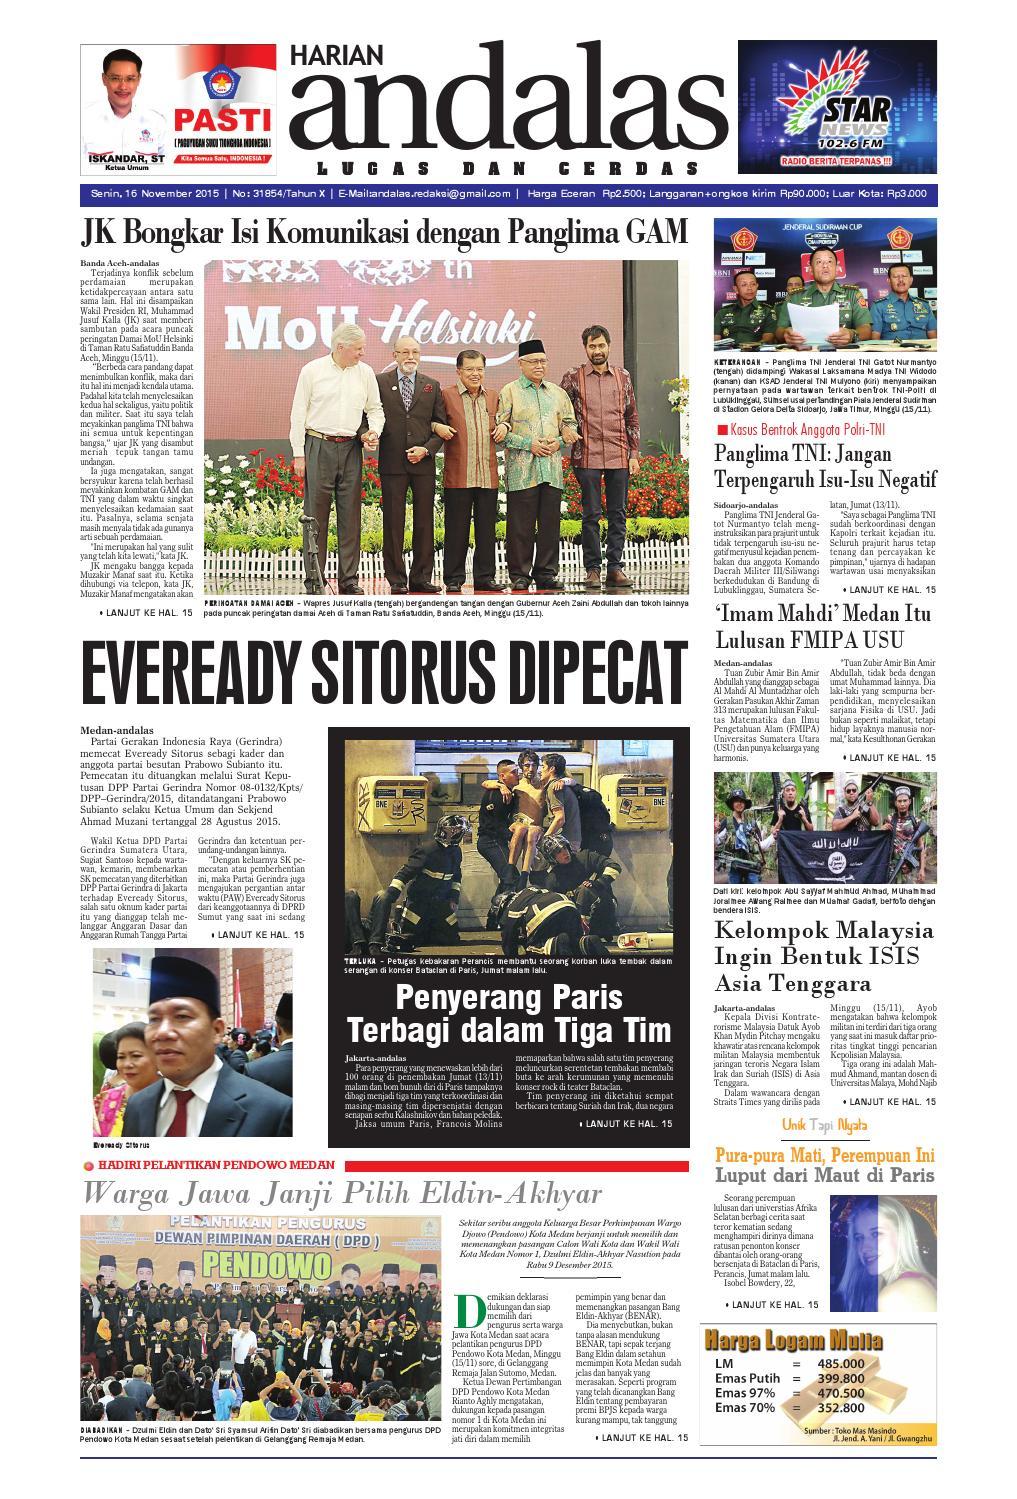 Epaper Andalas Edisi Senin 16 November 2015 By Media Issuu Dat Arini Tenun Maroon Blue Ballerina